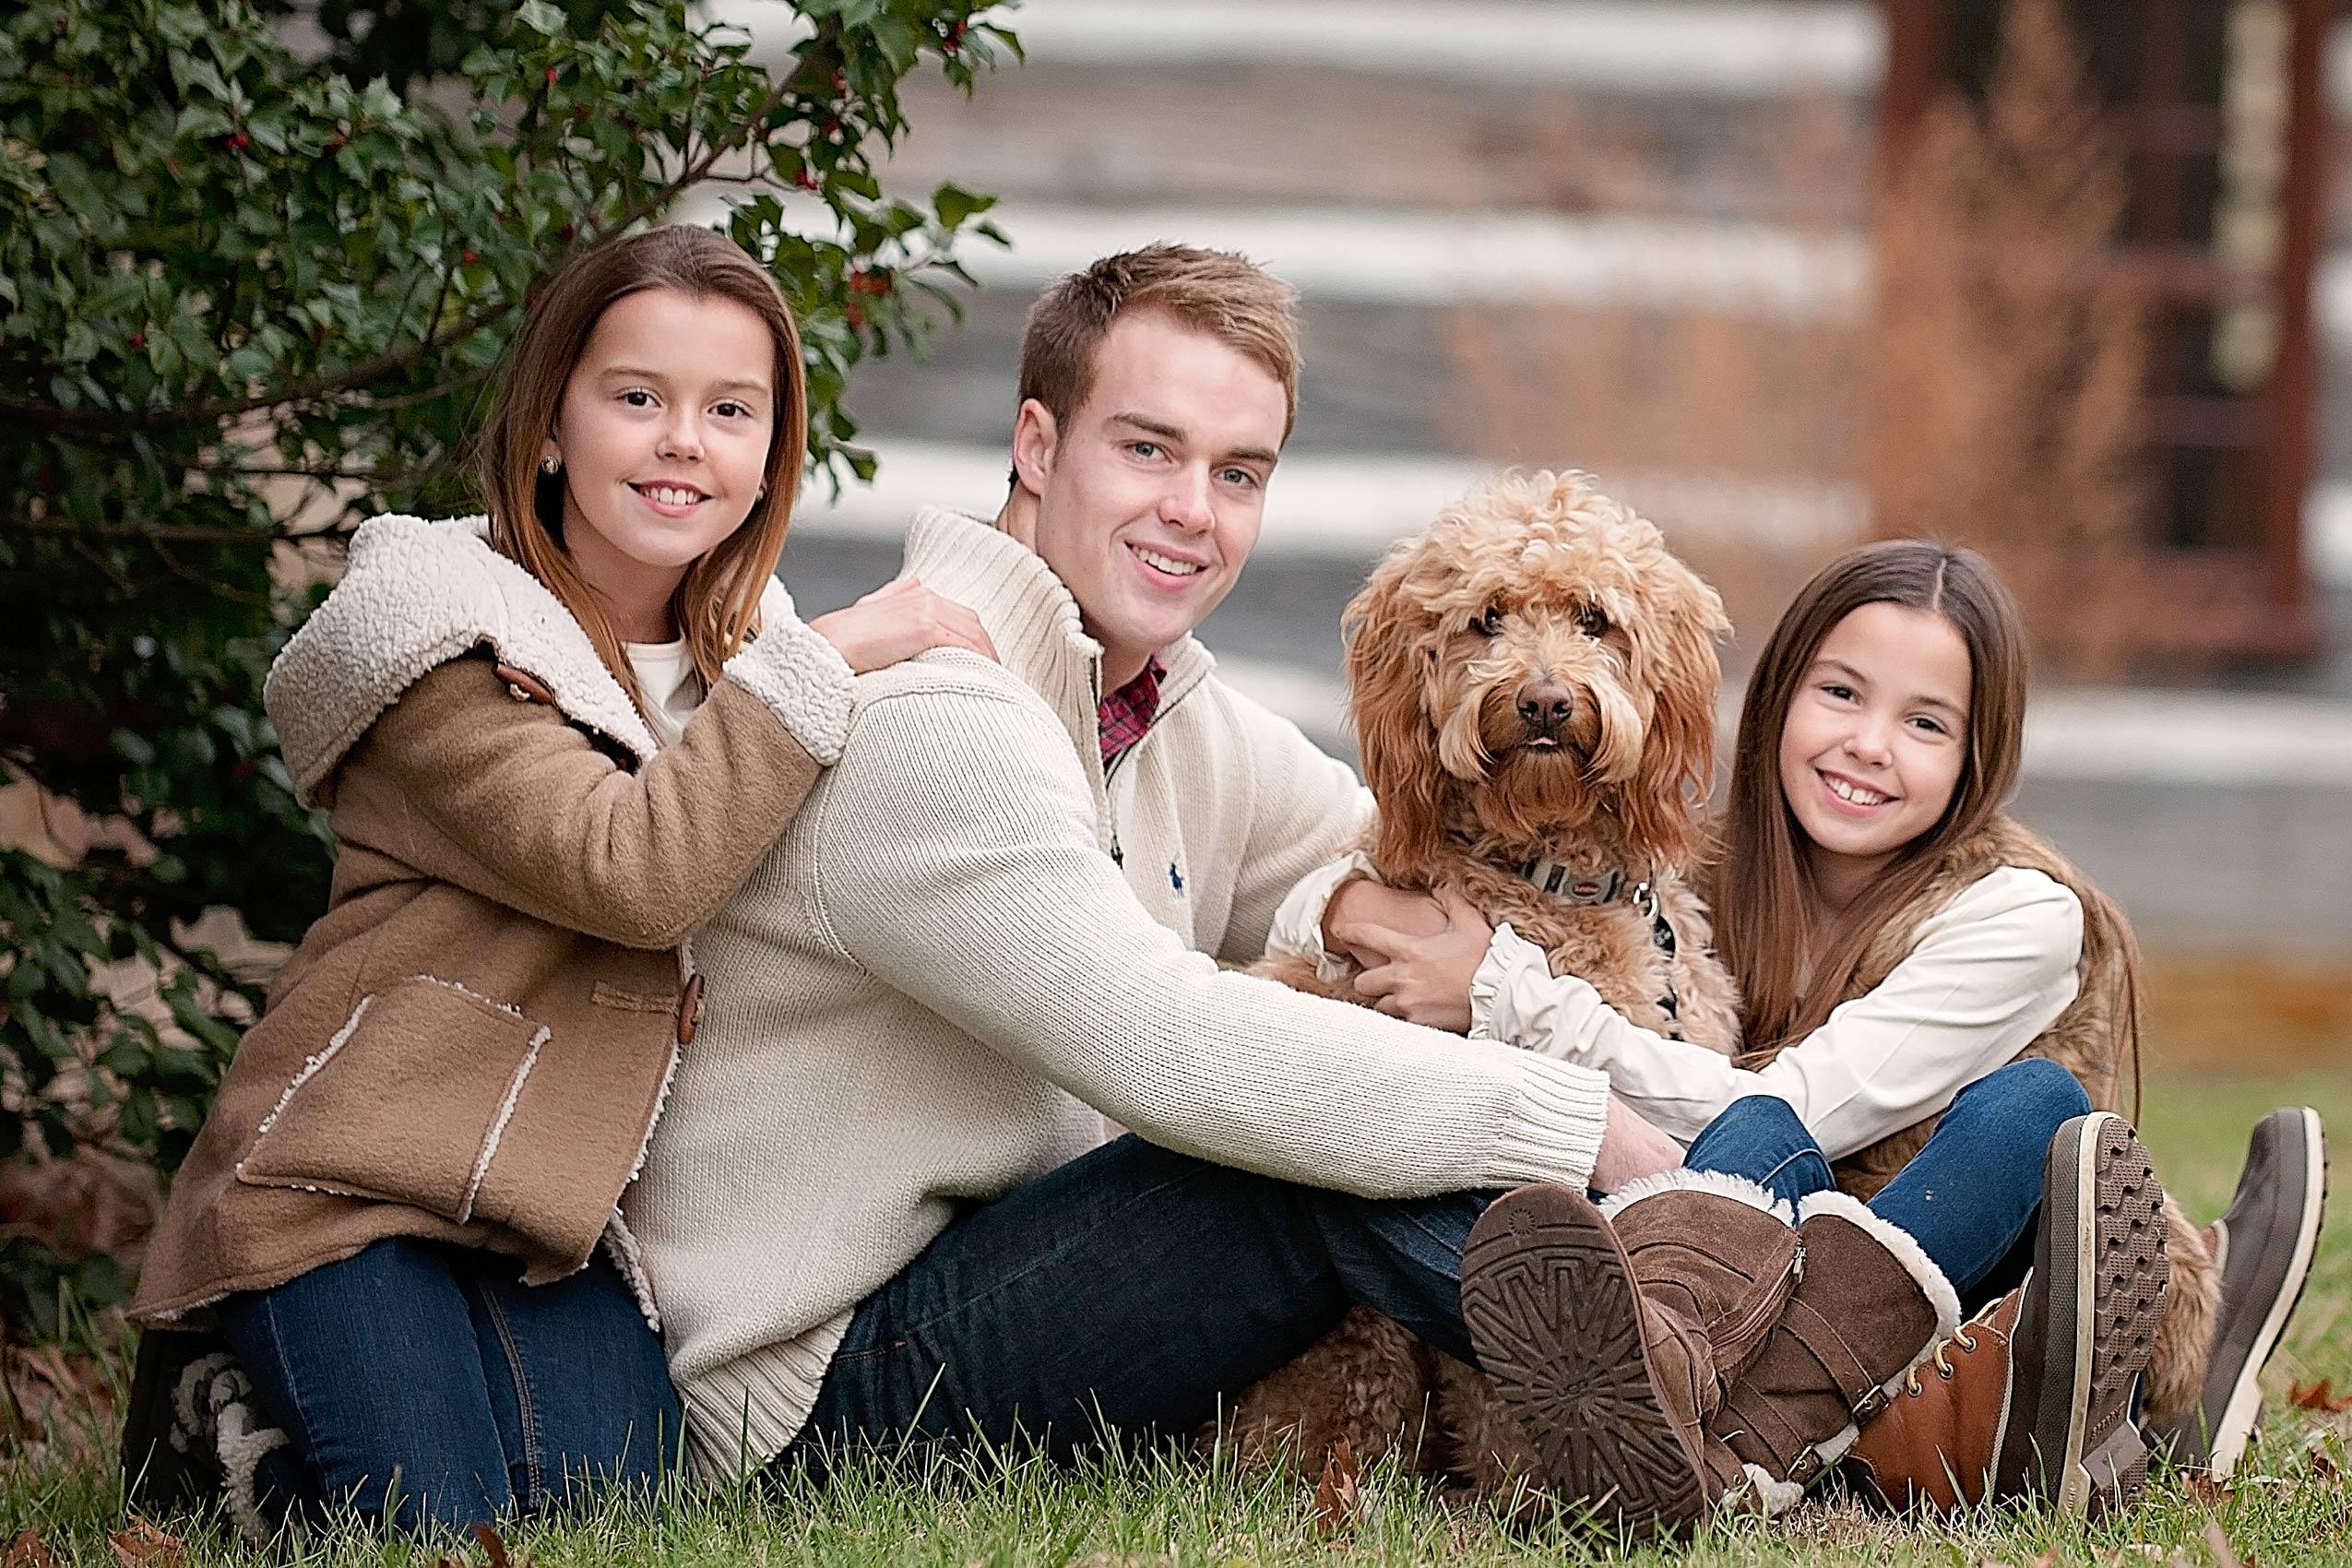 Children-with-Pets-Kentucky-Portrait.jpg